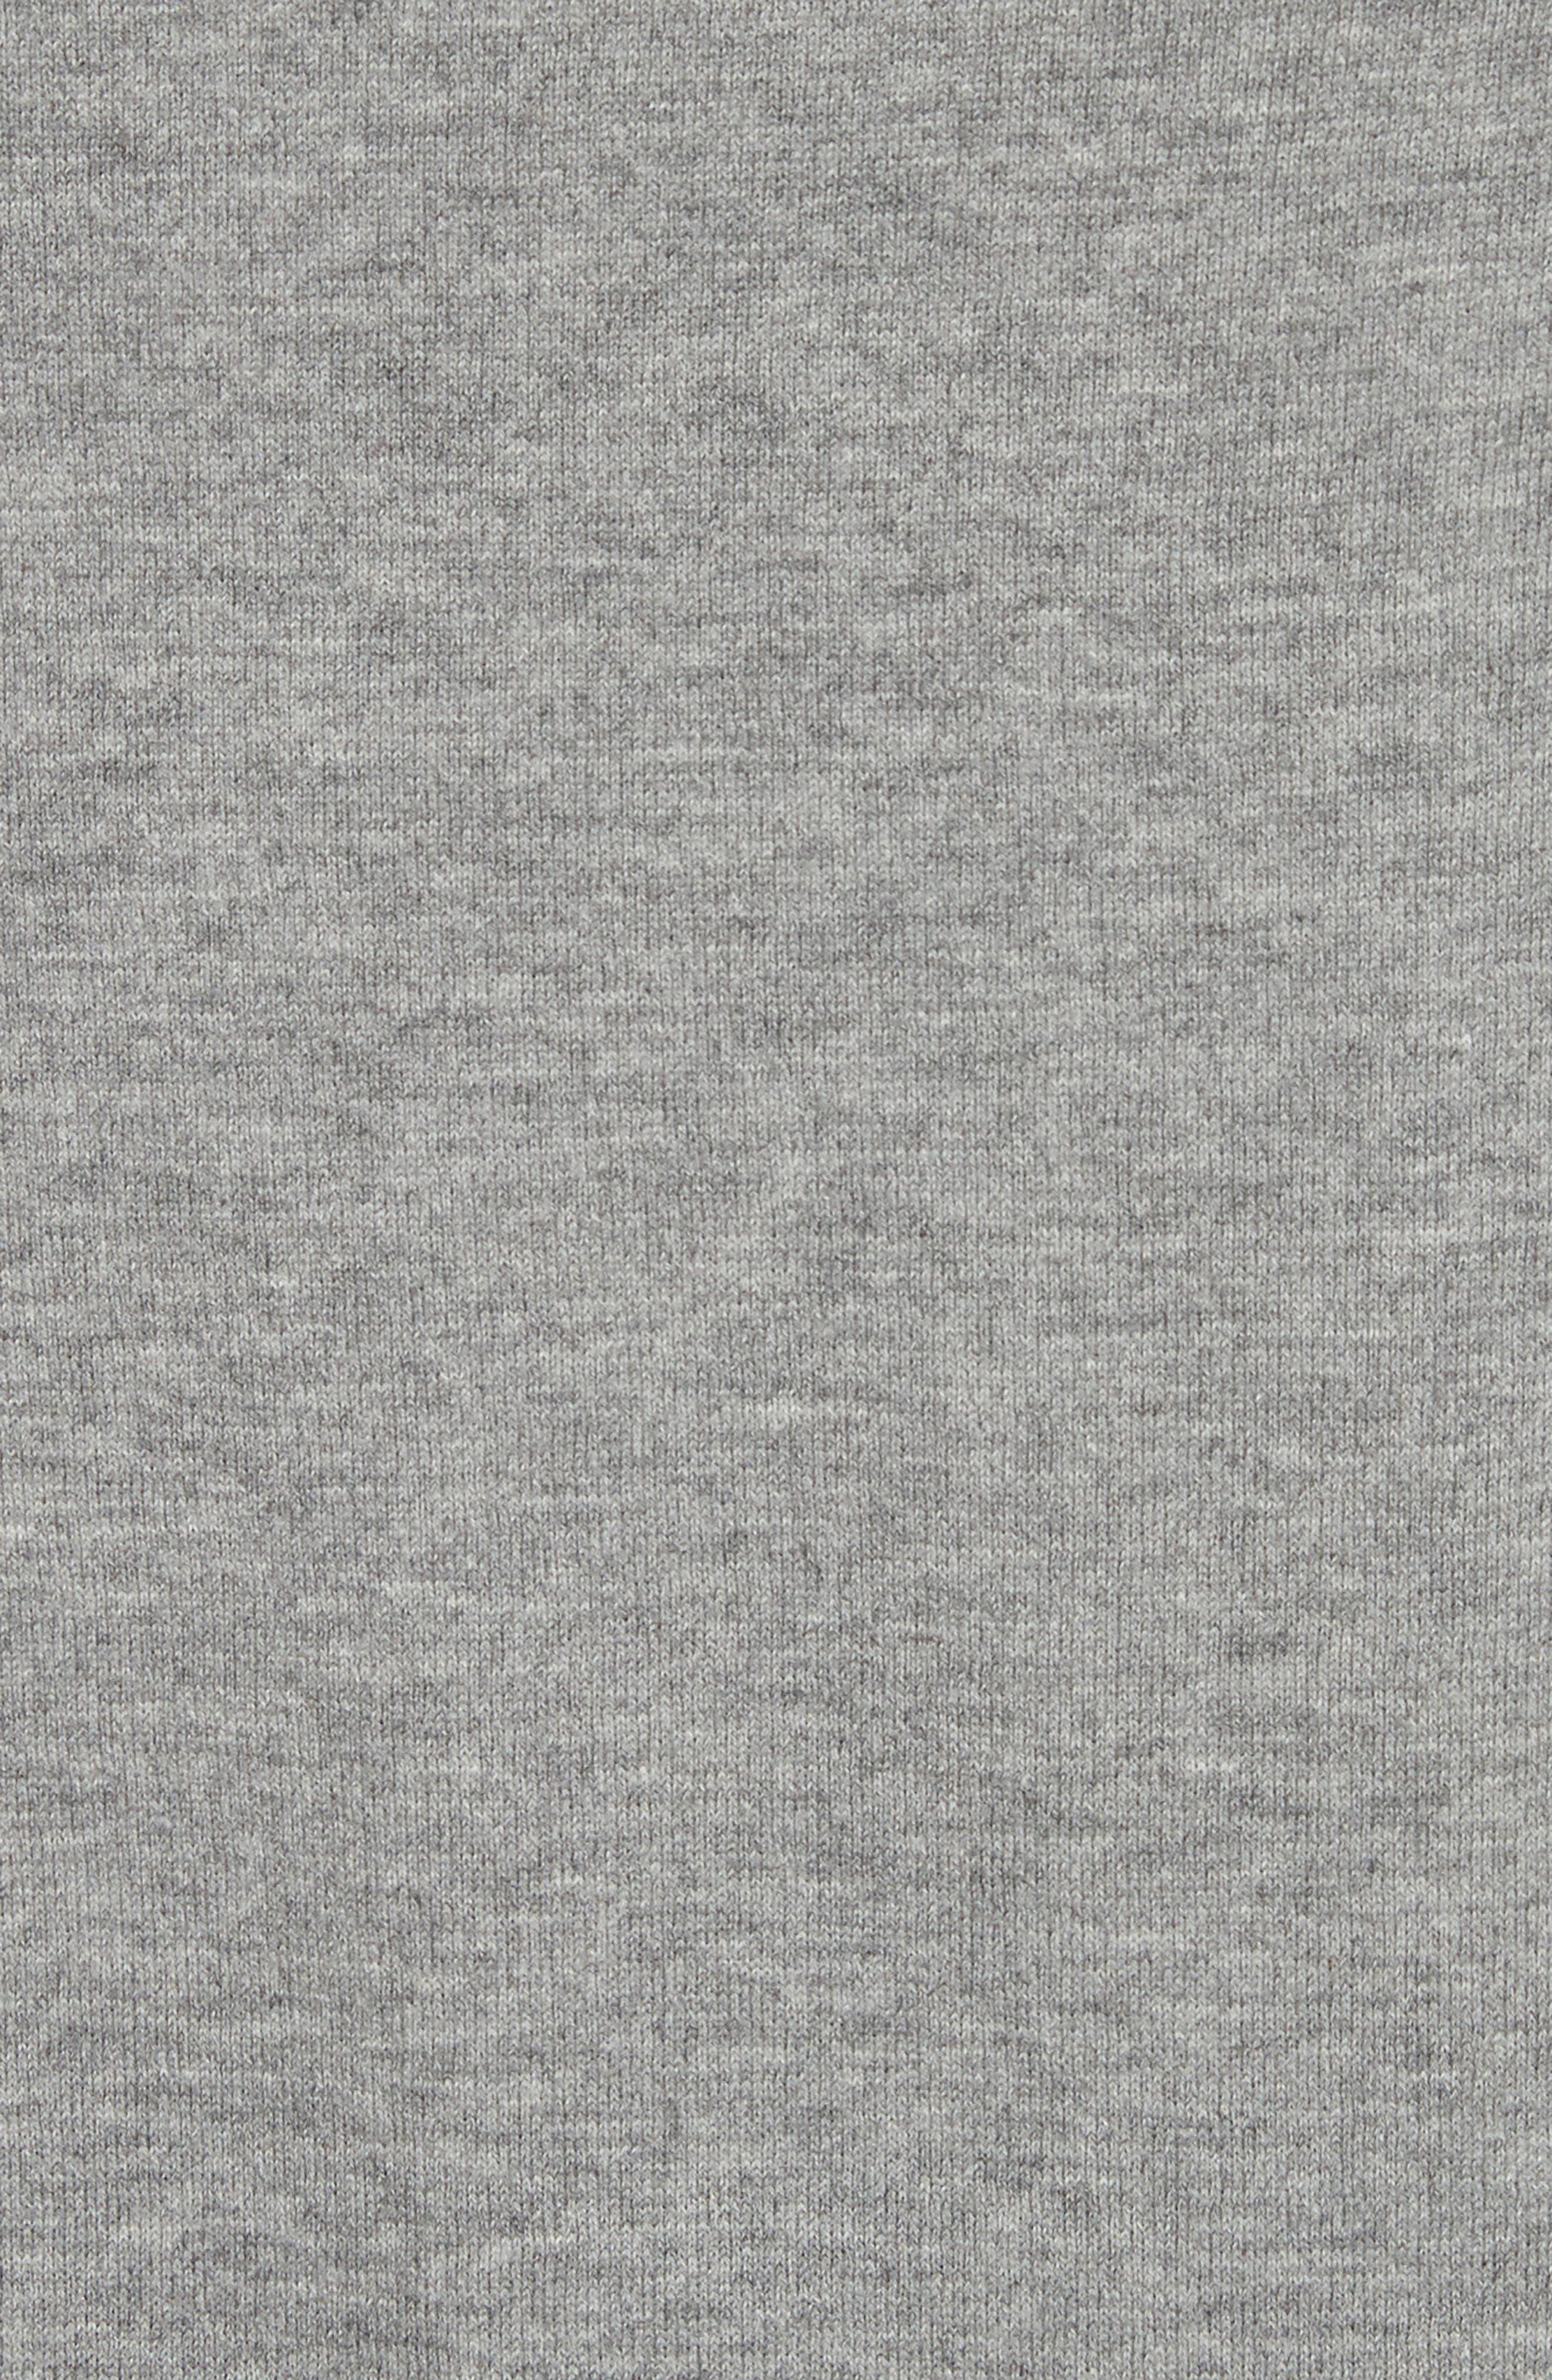 Convertible Off the Shoulder Sweater,                             Alternate thumbnail 6, color,                             Nickel Melange